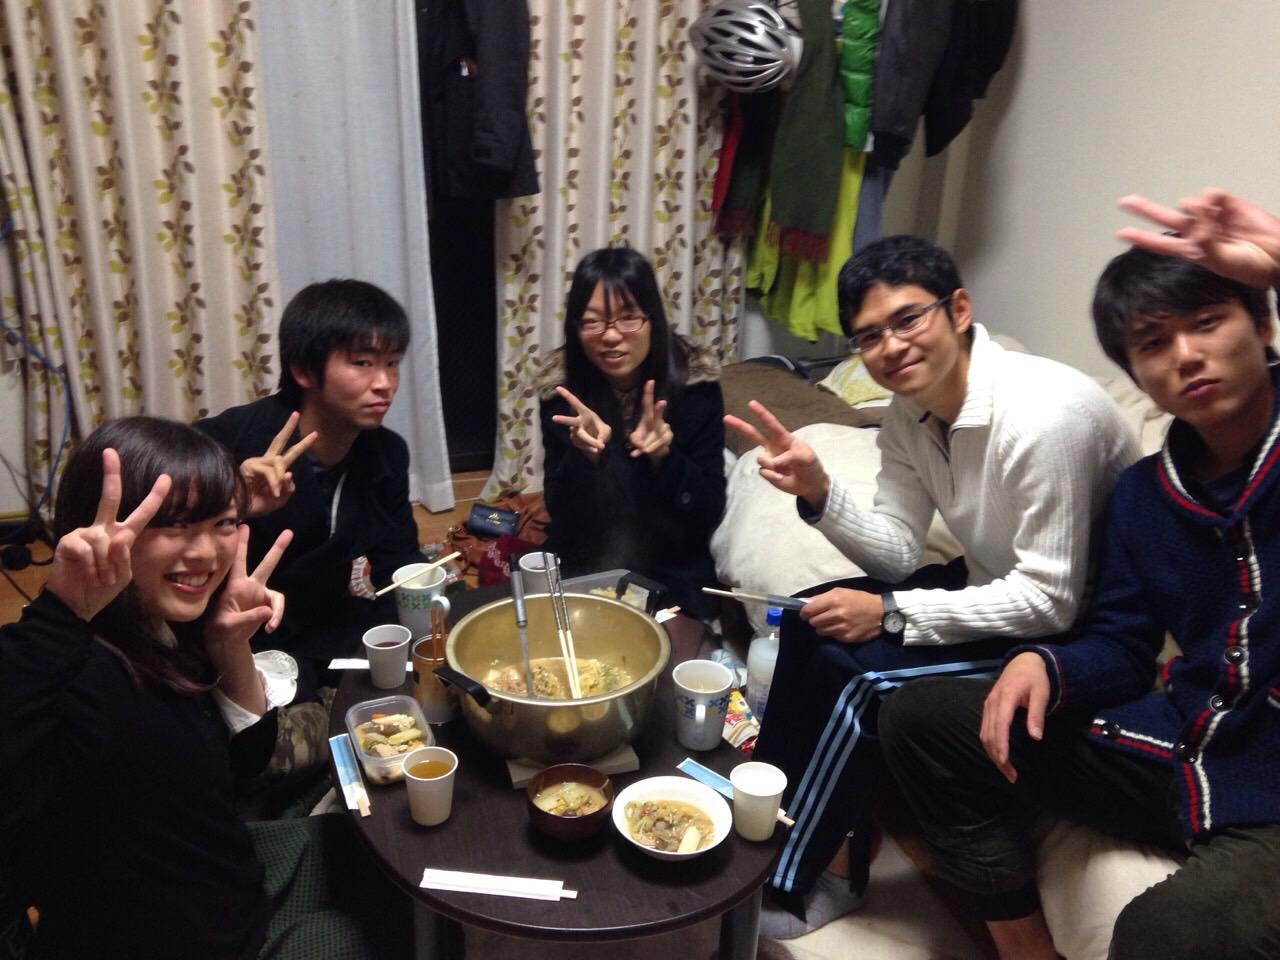 IMG_4894-3.JPG